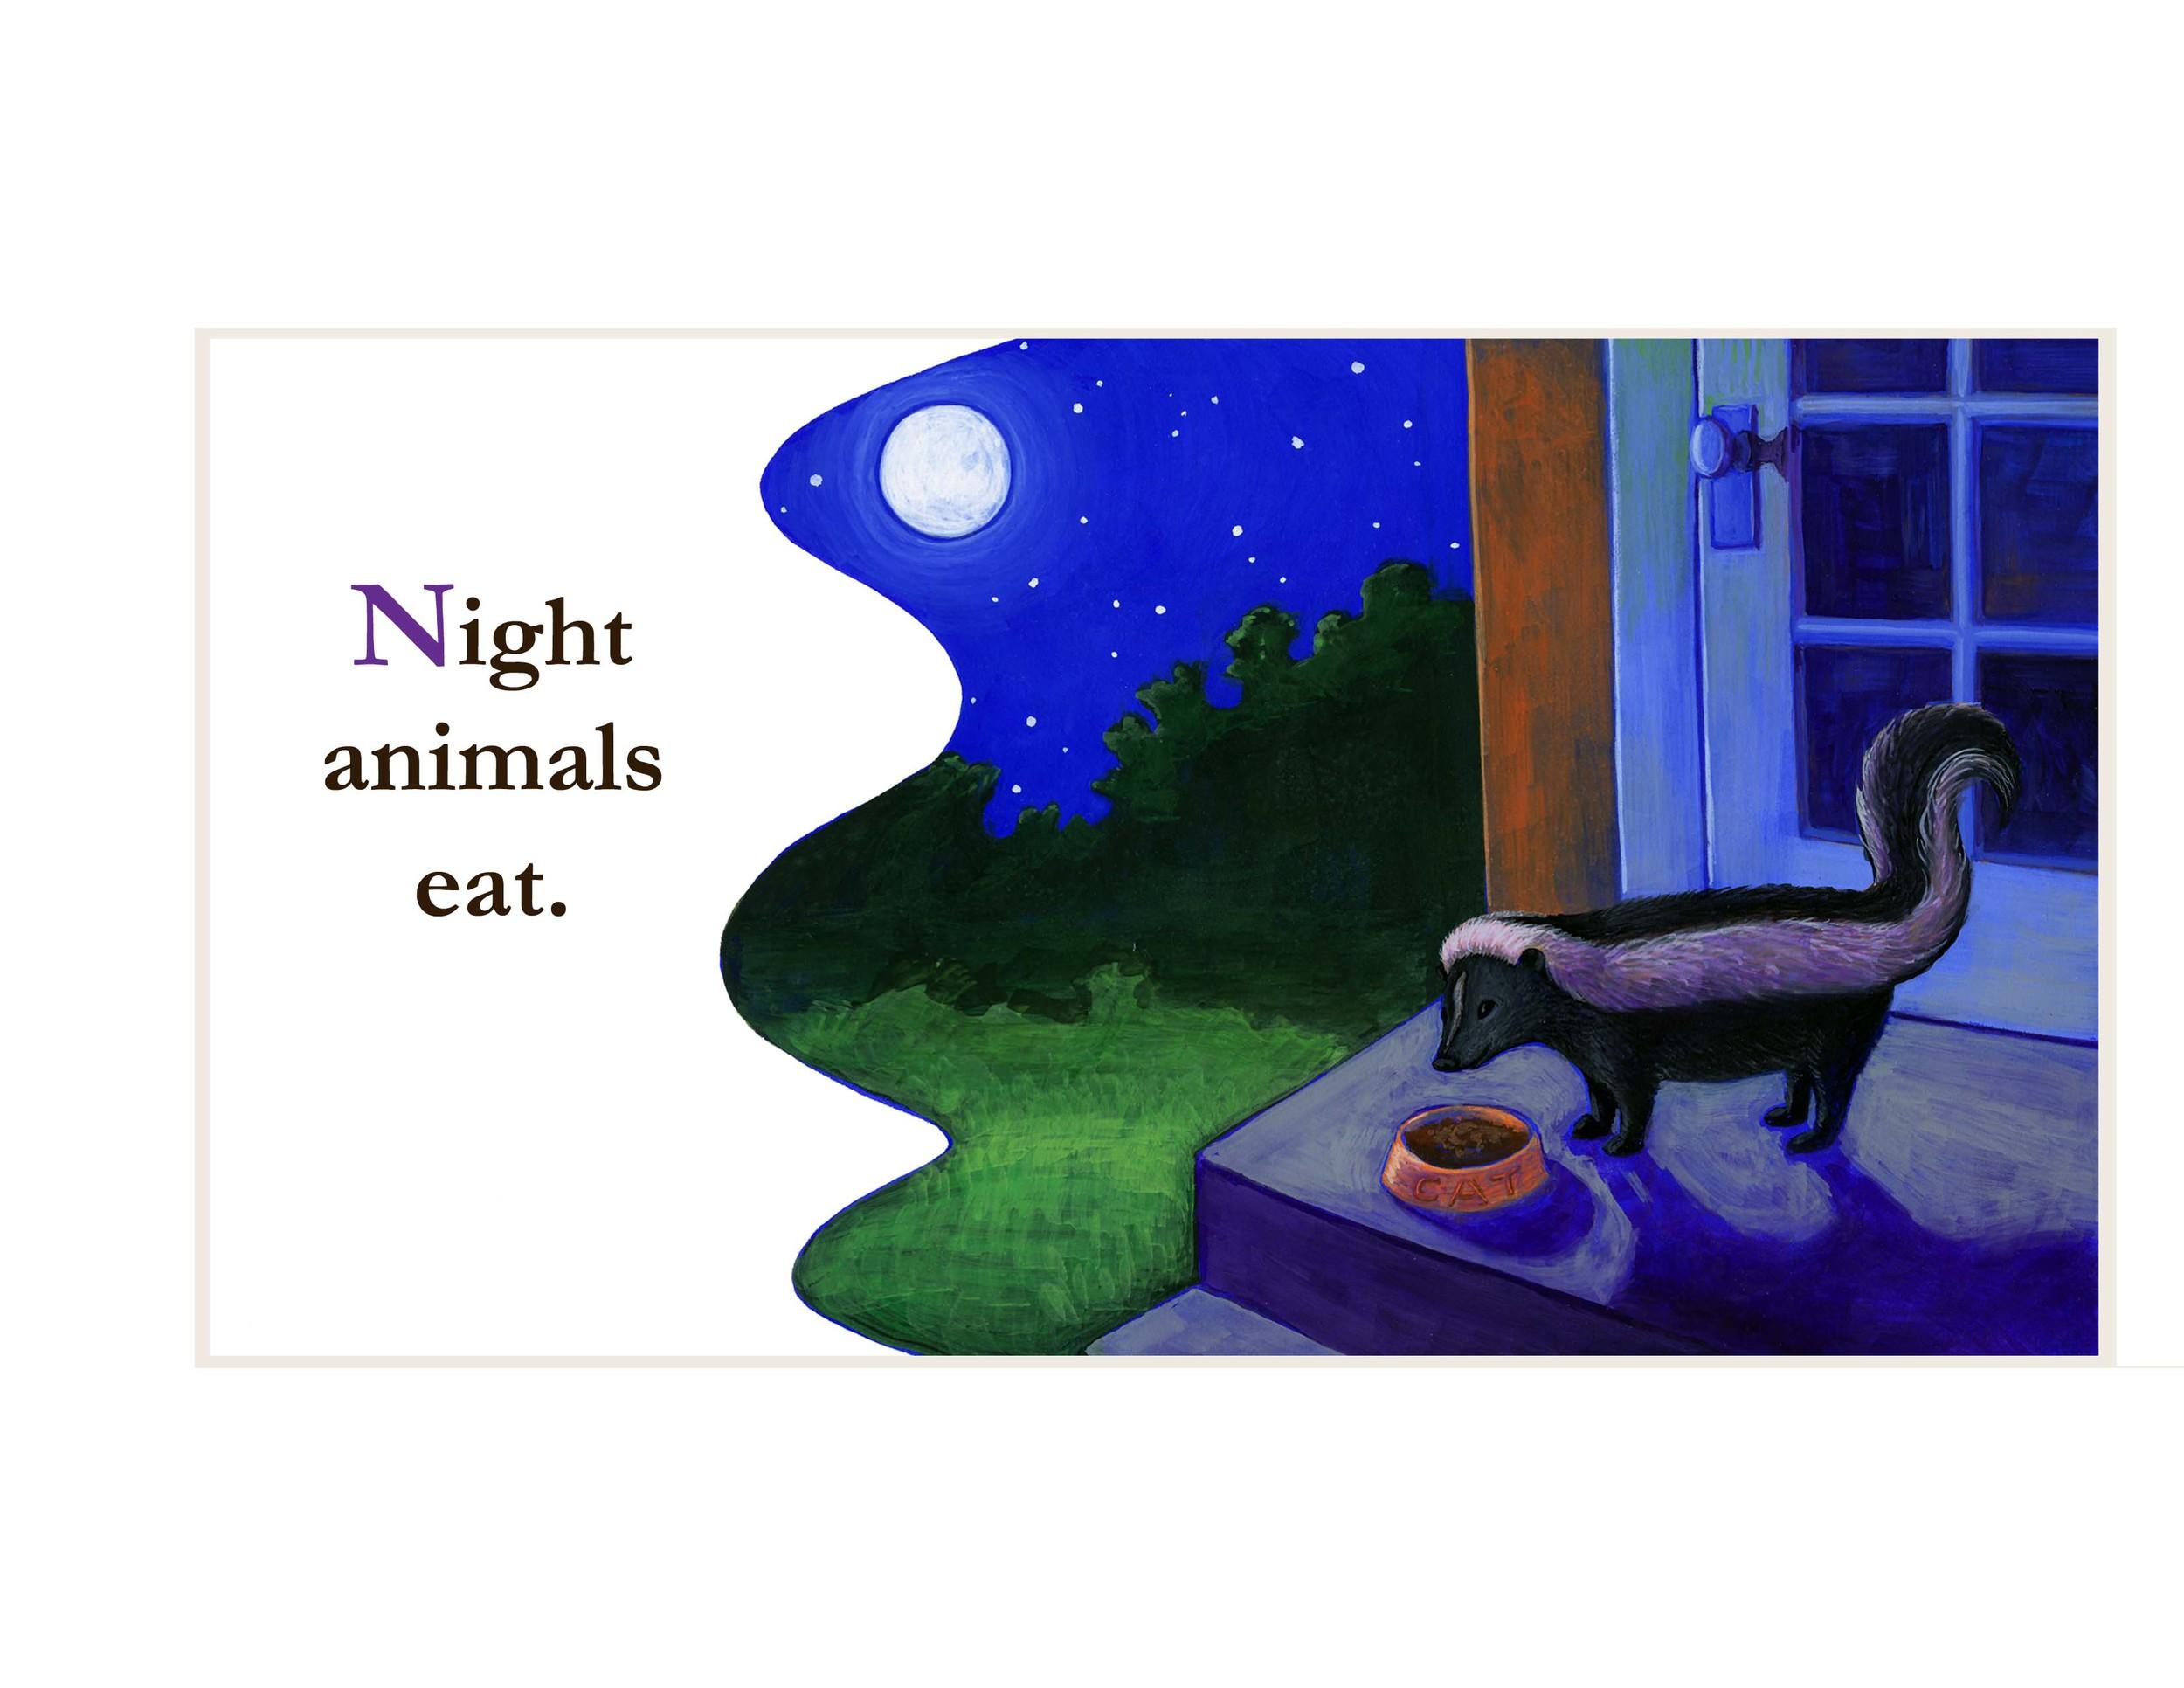 night animals book 9.jpg